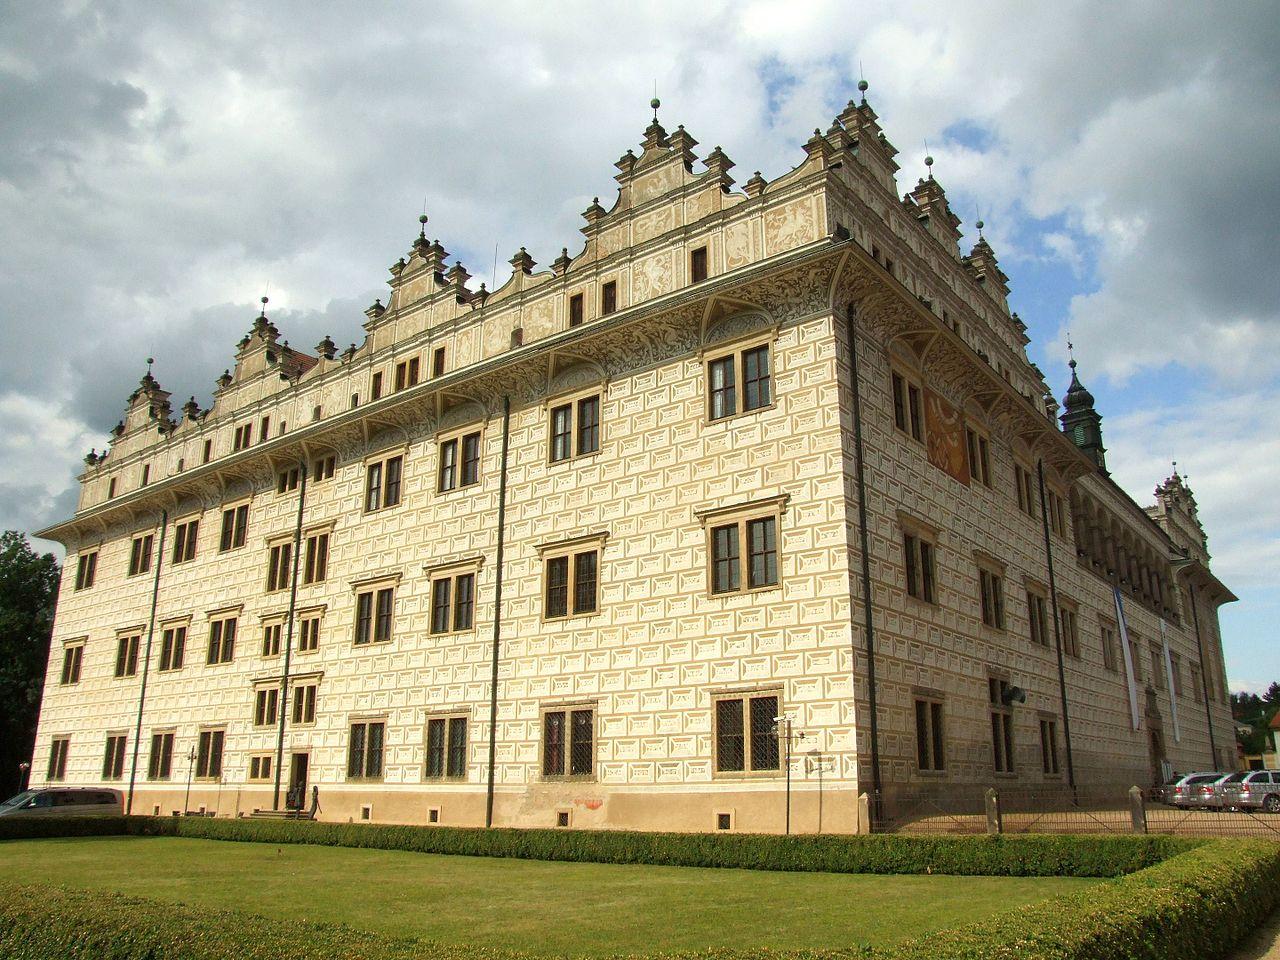 Castelul Lytomysl